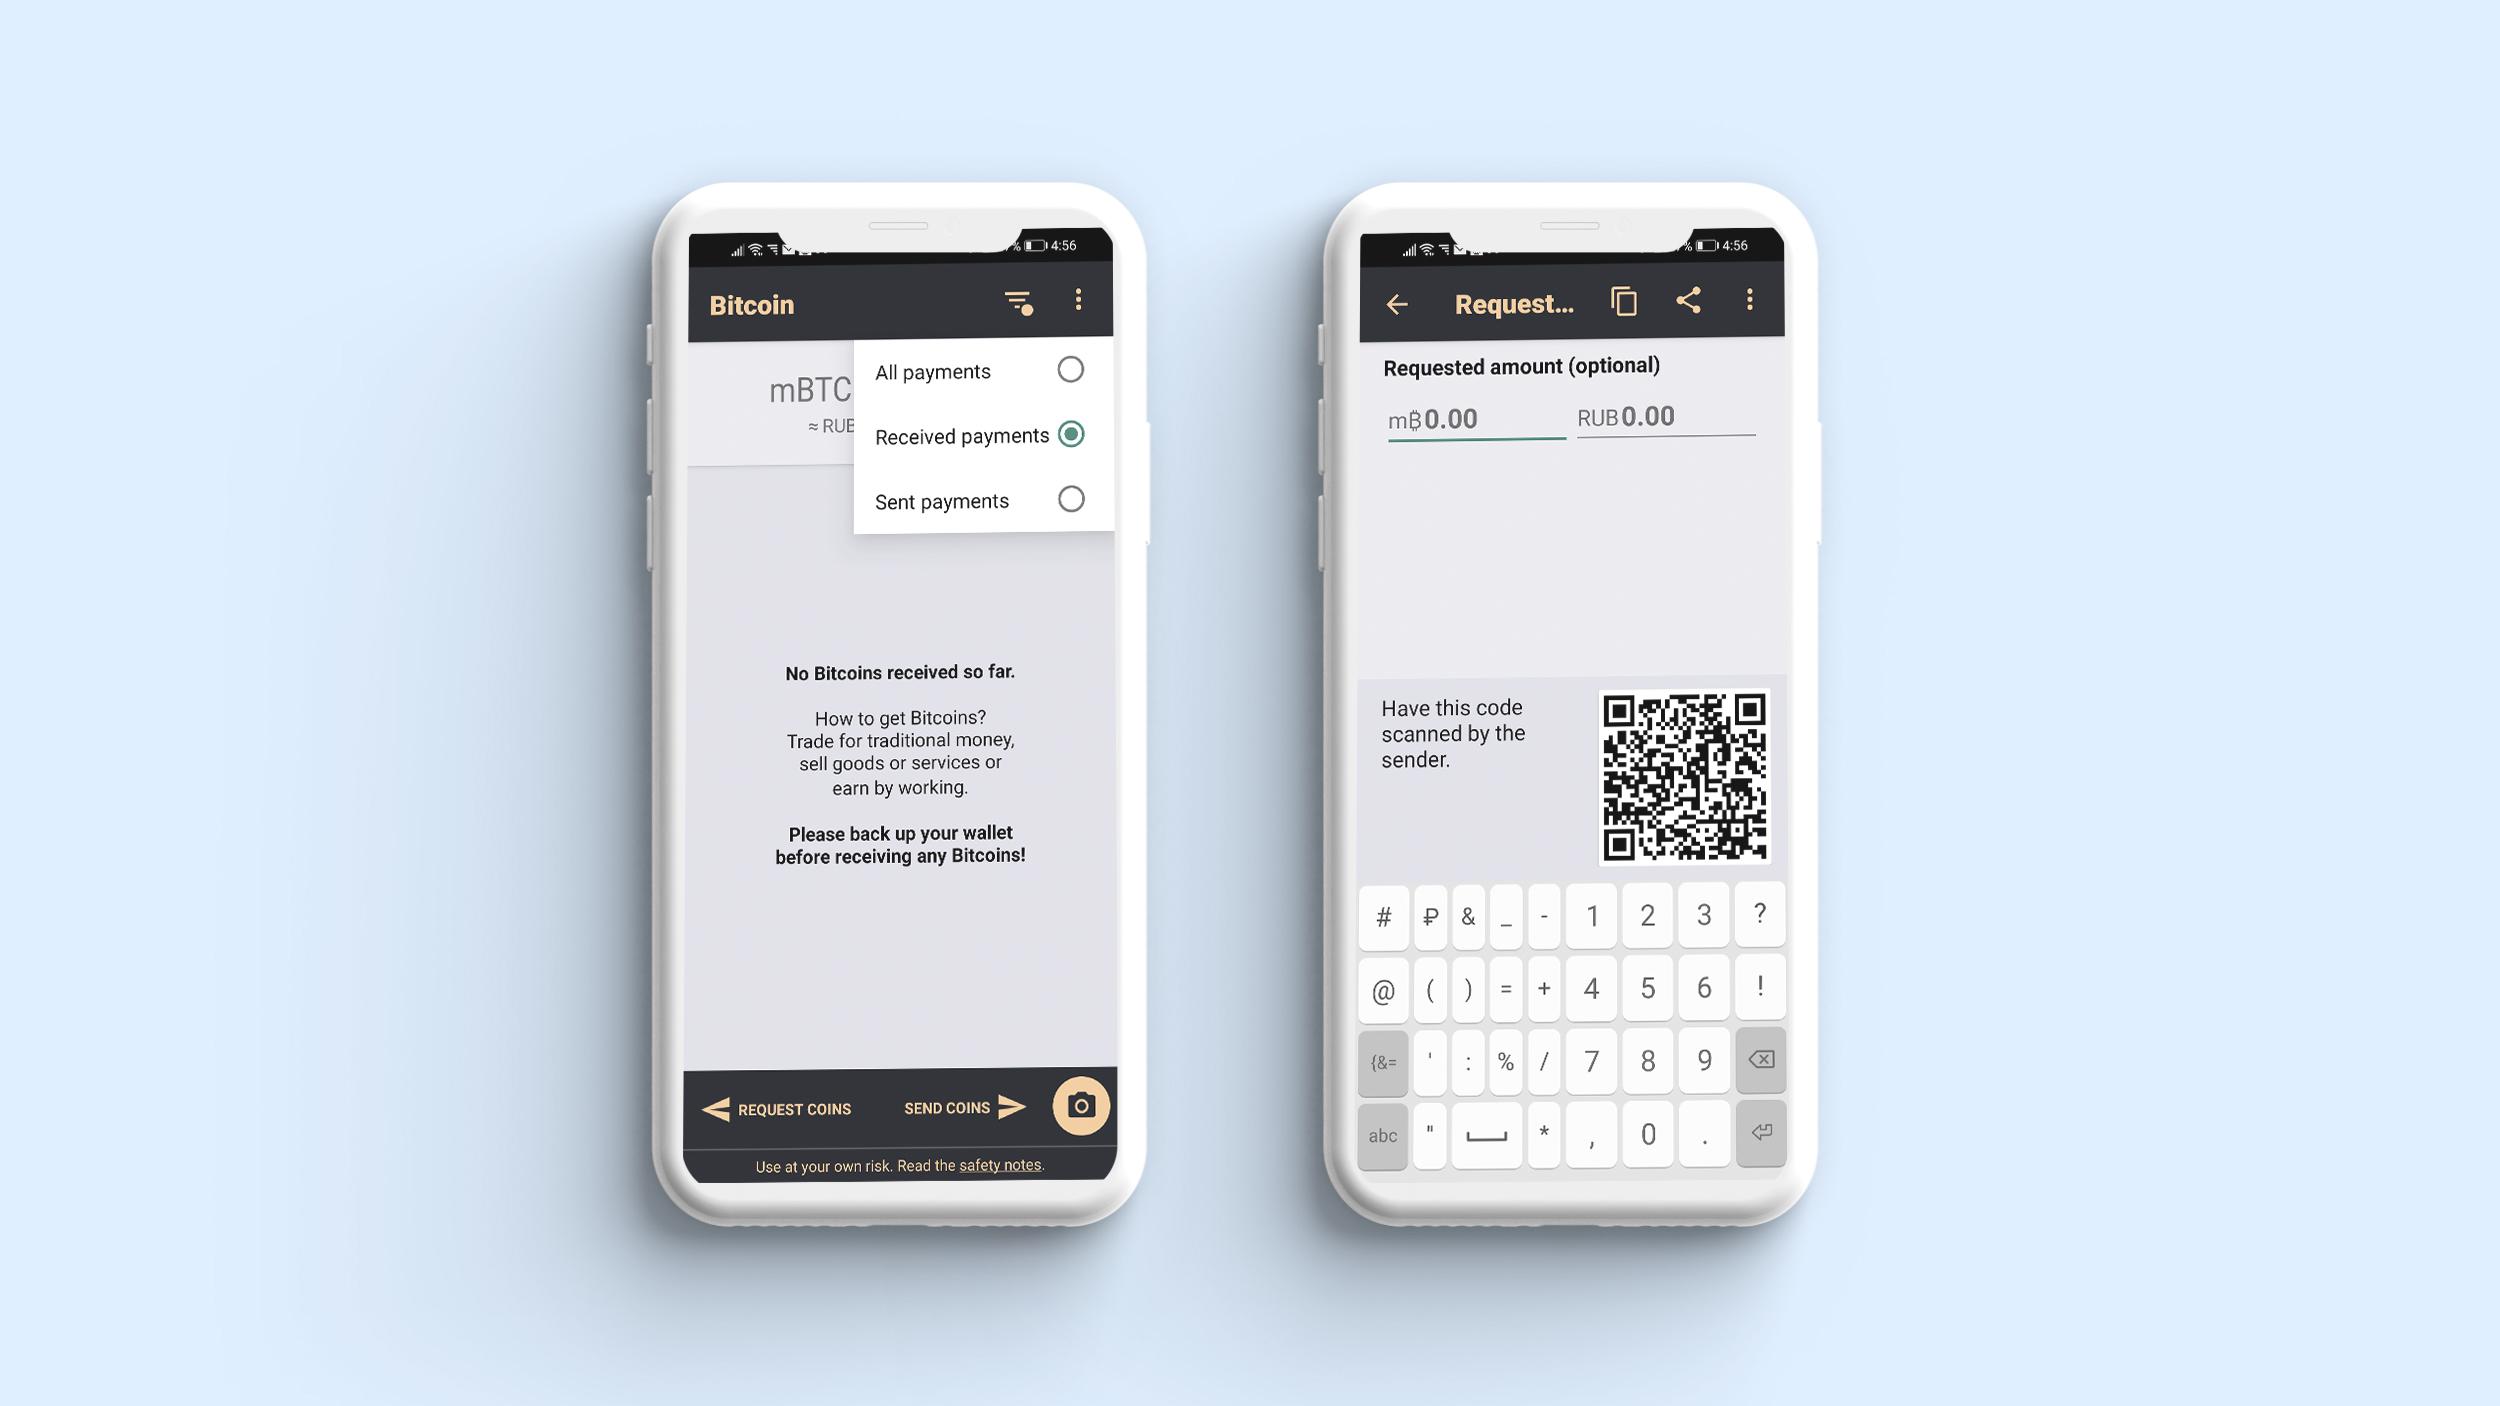 Transaction screen in crypto wallet app